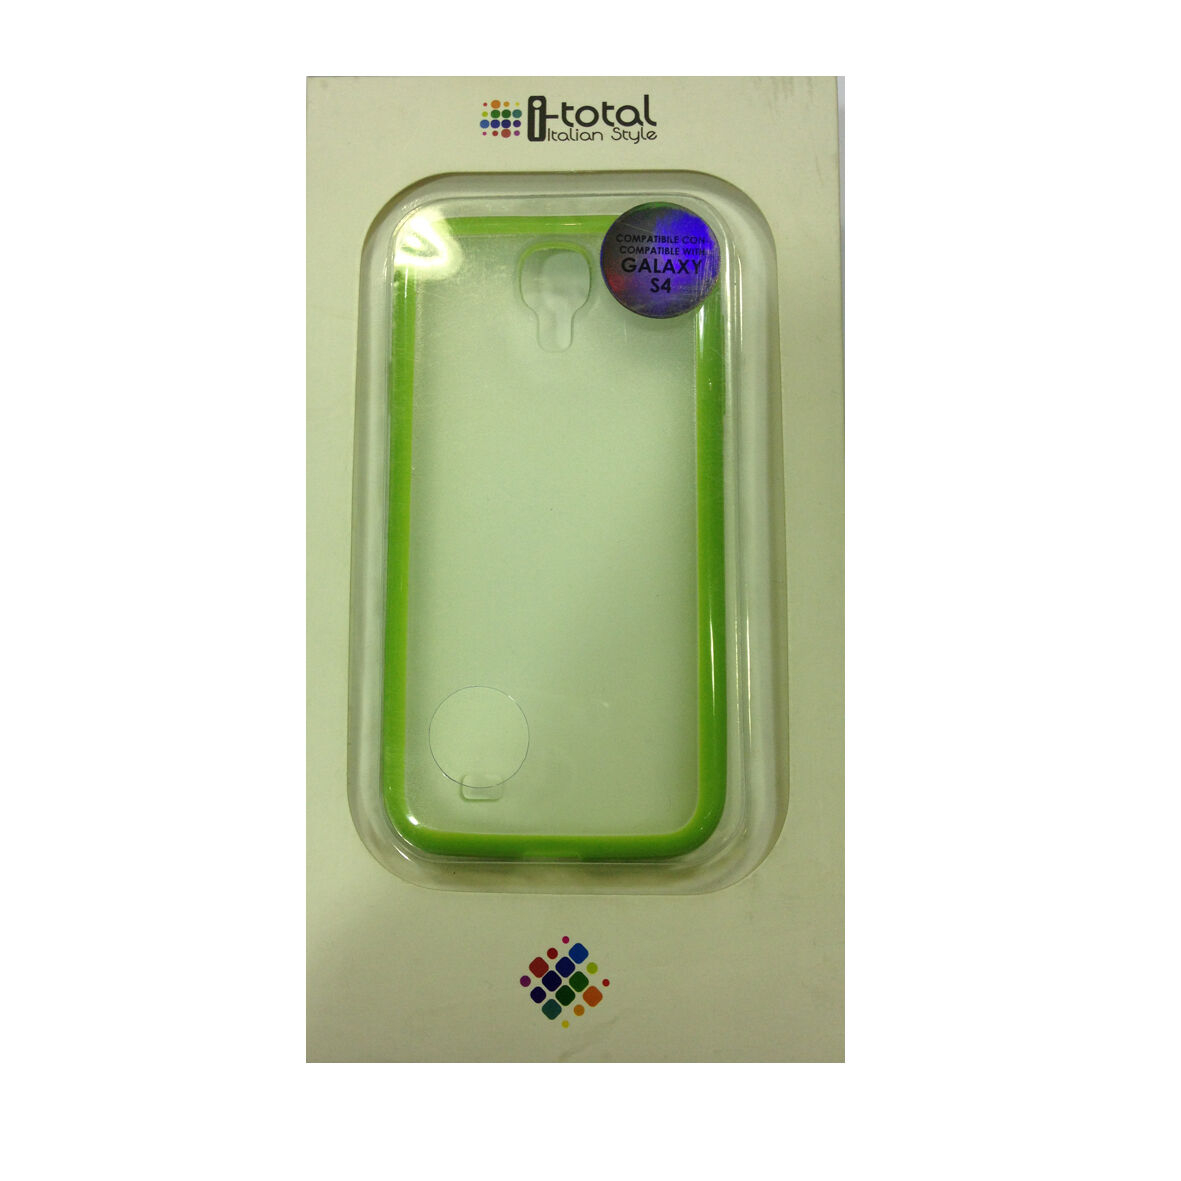 COVER mascherina SAMSUNG GALAXY S4 trasparente con contorno verde rigida I-TOTAL